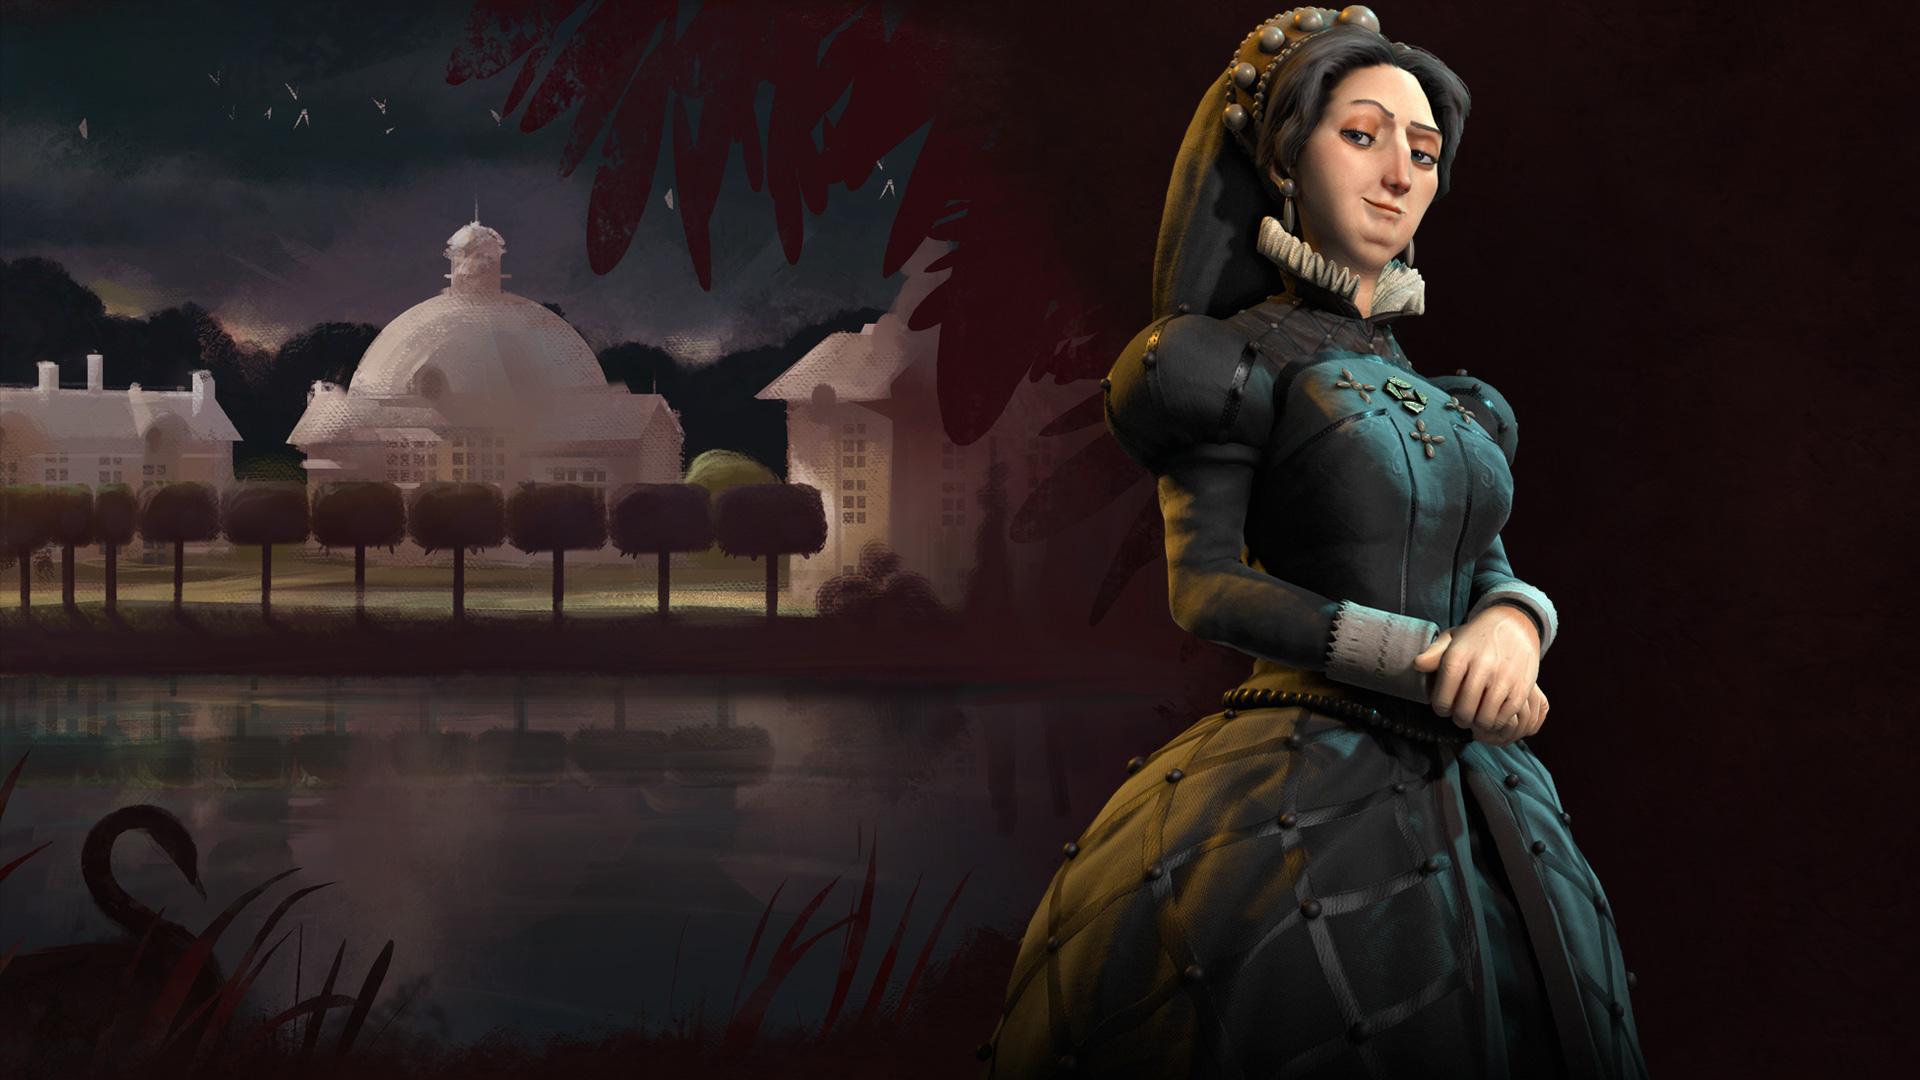 Fixes for Sid Meier's Civilization VI: Errors Tutorial